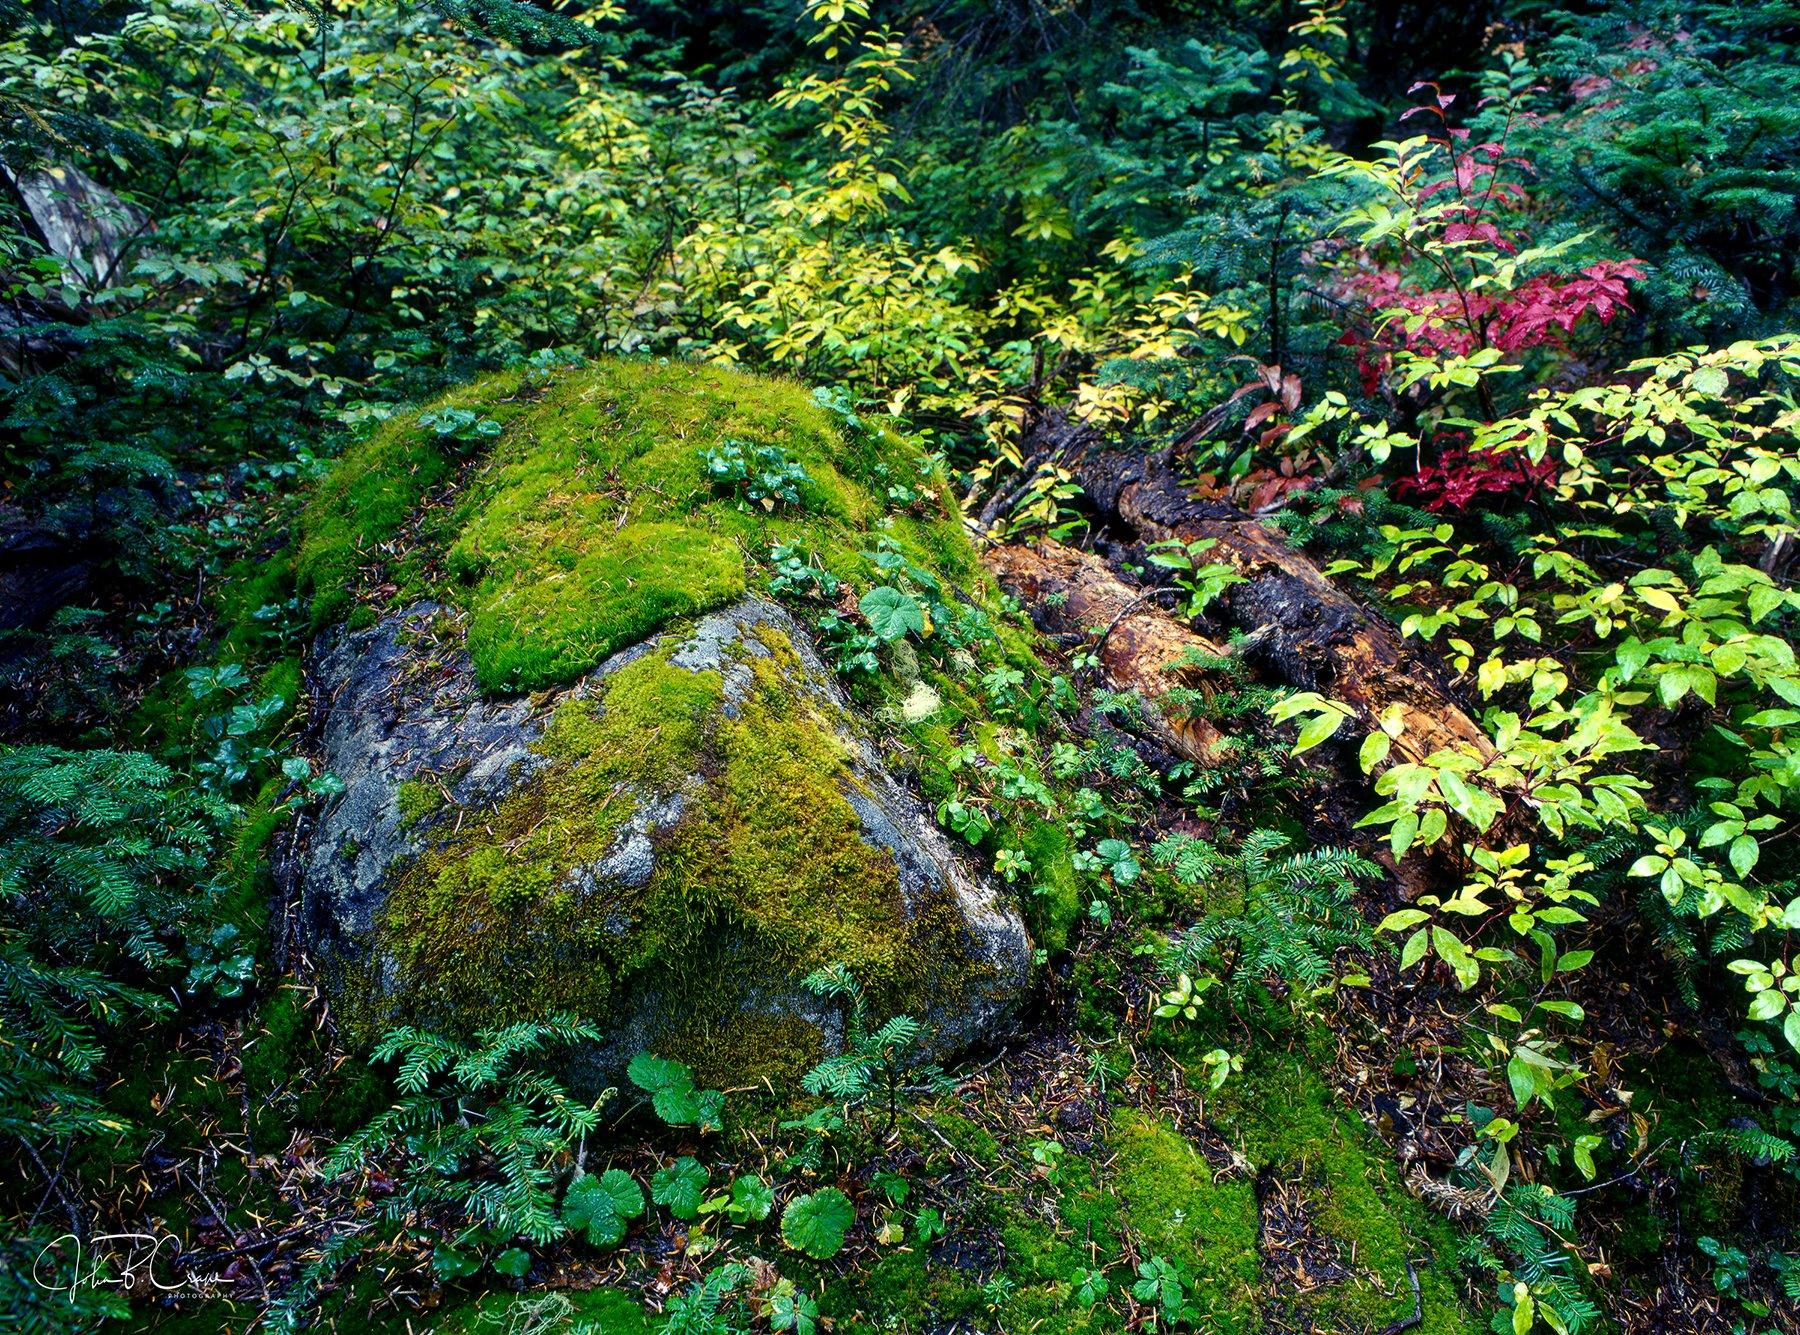 Rainy Lake Trail, North Cascades National Park, Washington